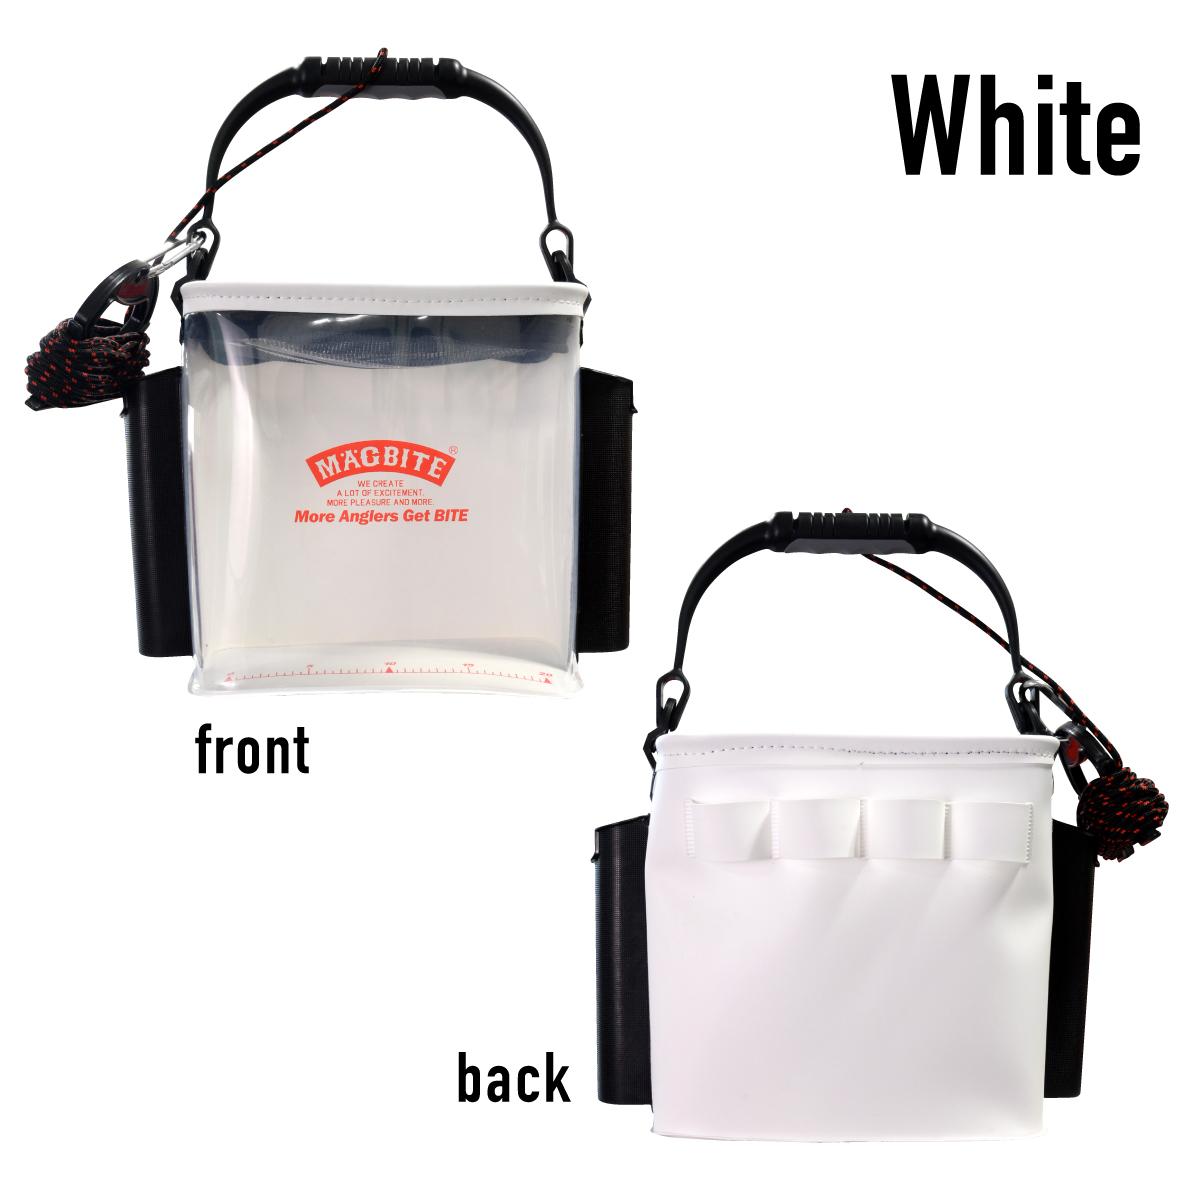 W:ホワイト